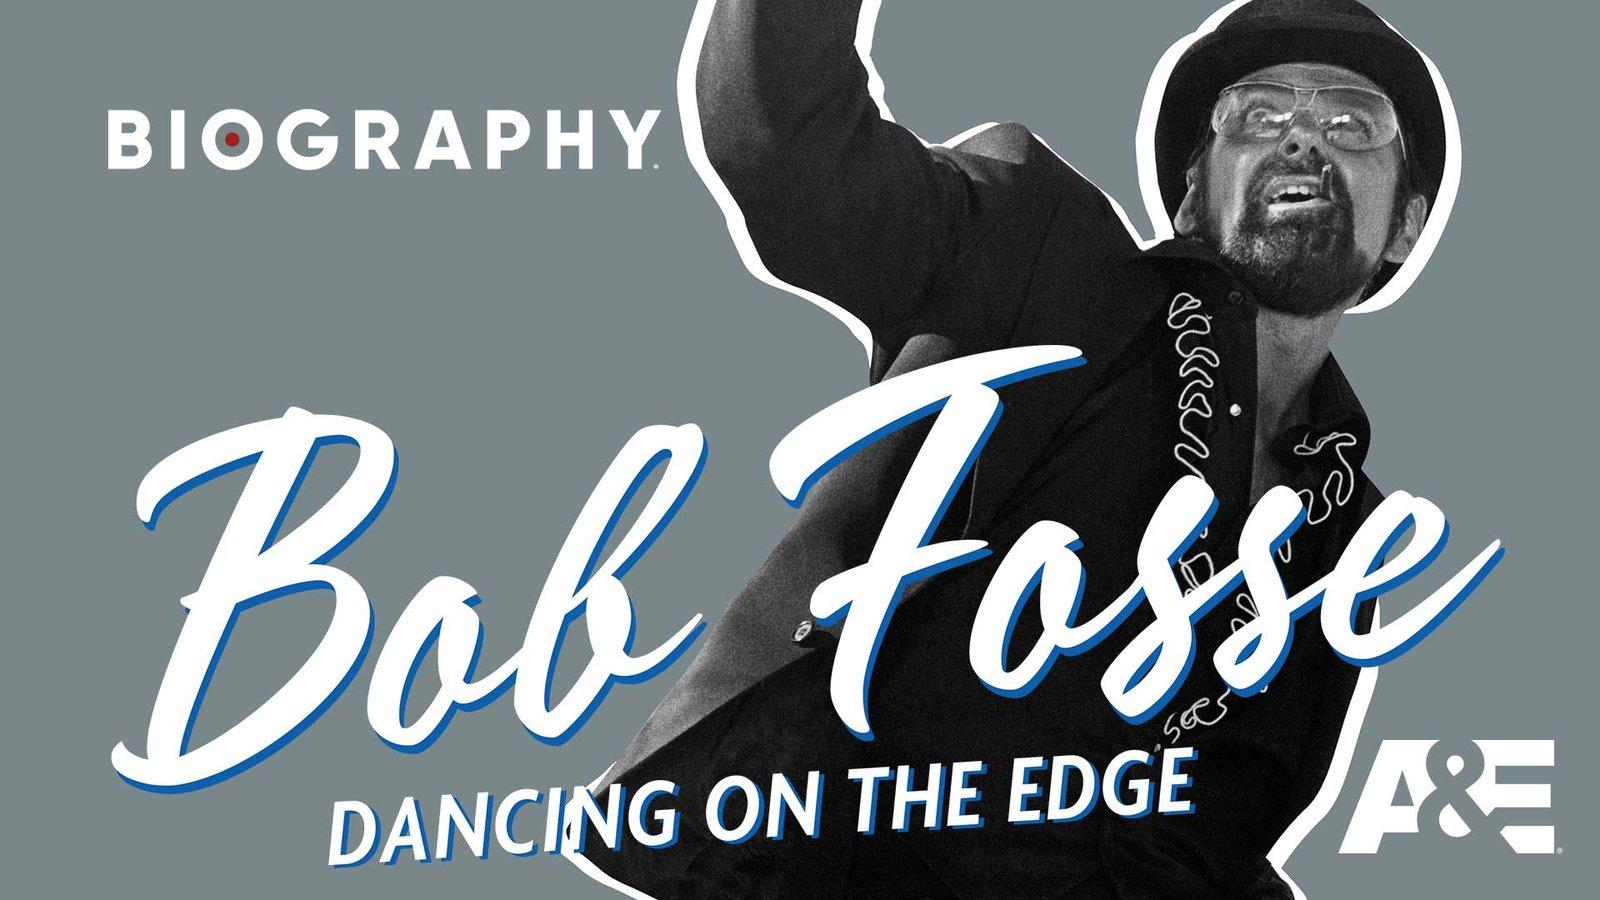 Bob Fosse: Dancing On The Edge